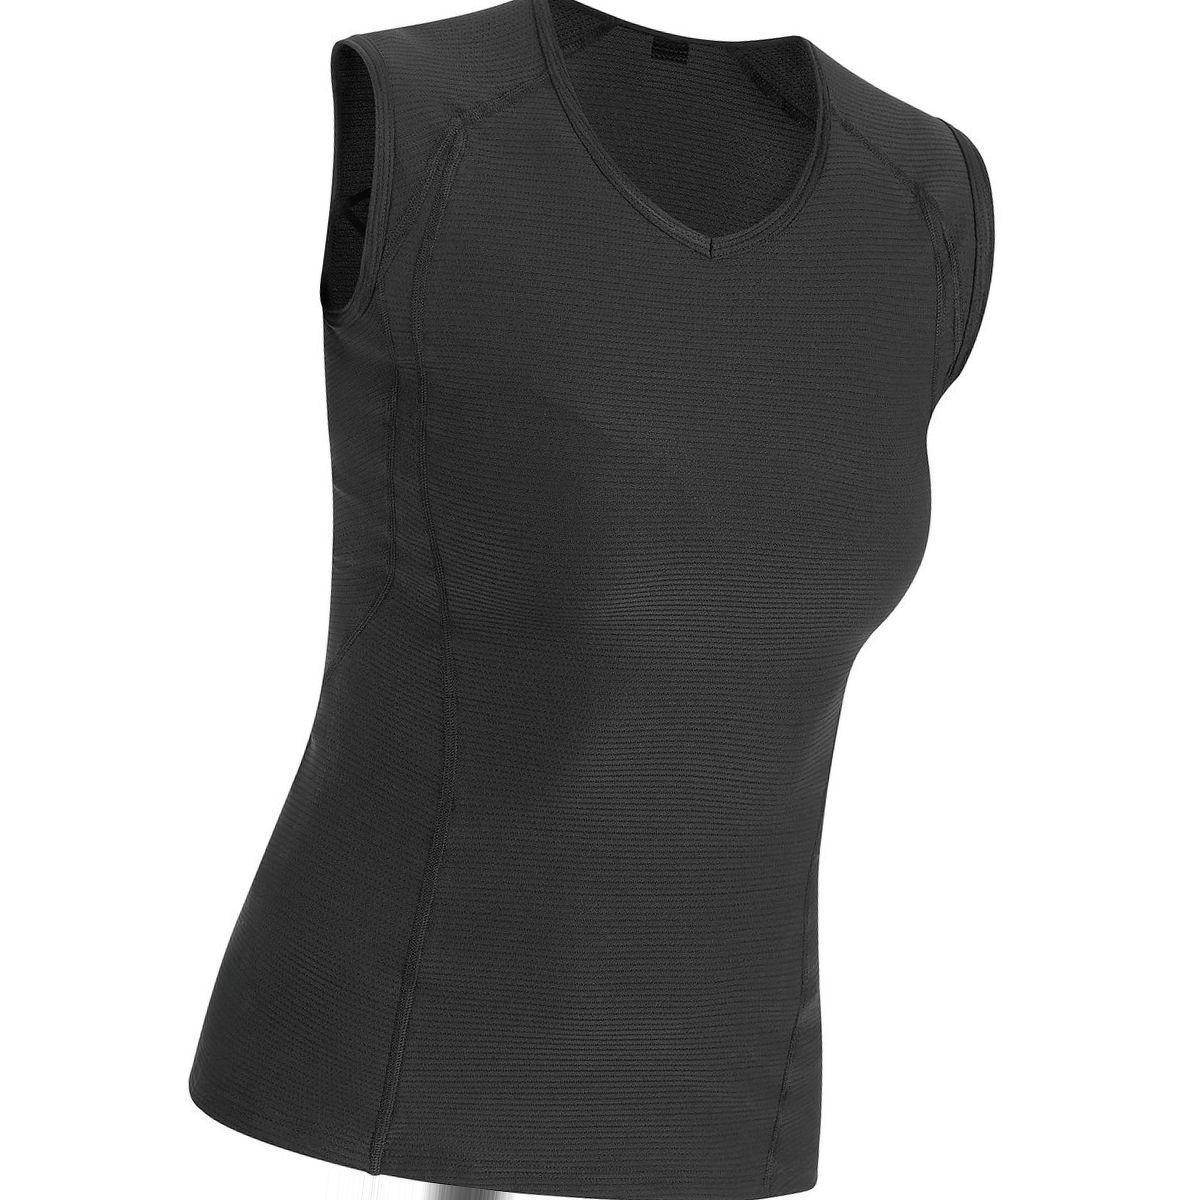 Gore Wear Base Layer Sleeveless Shirt - Women's